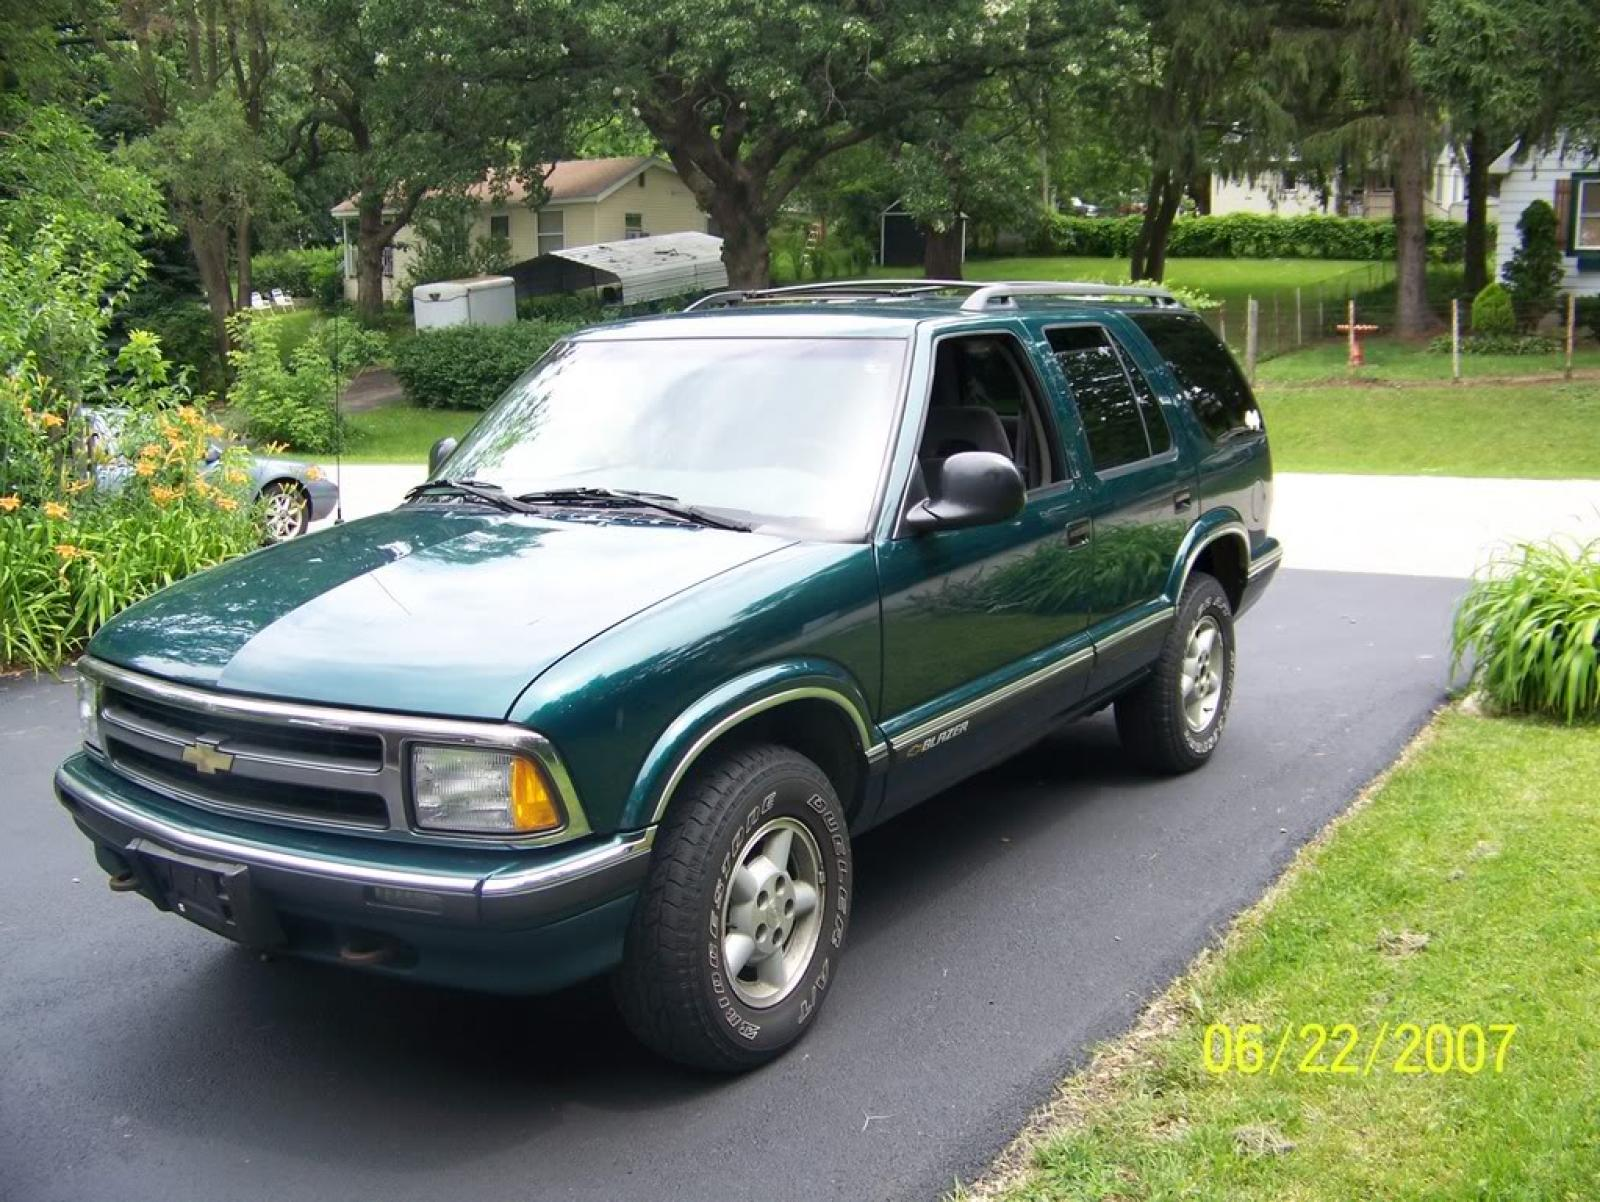 800 1024 1280 1600 Origin 1996 Chevrolet Blazer